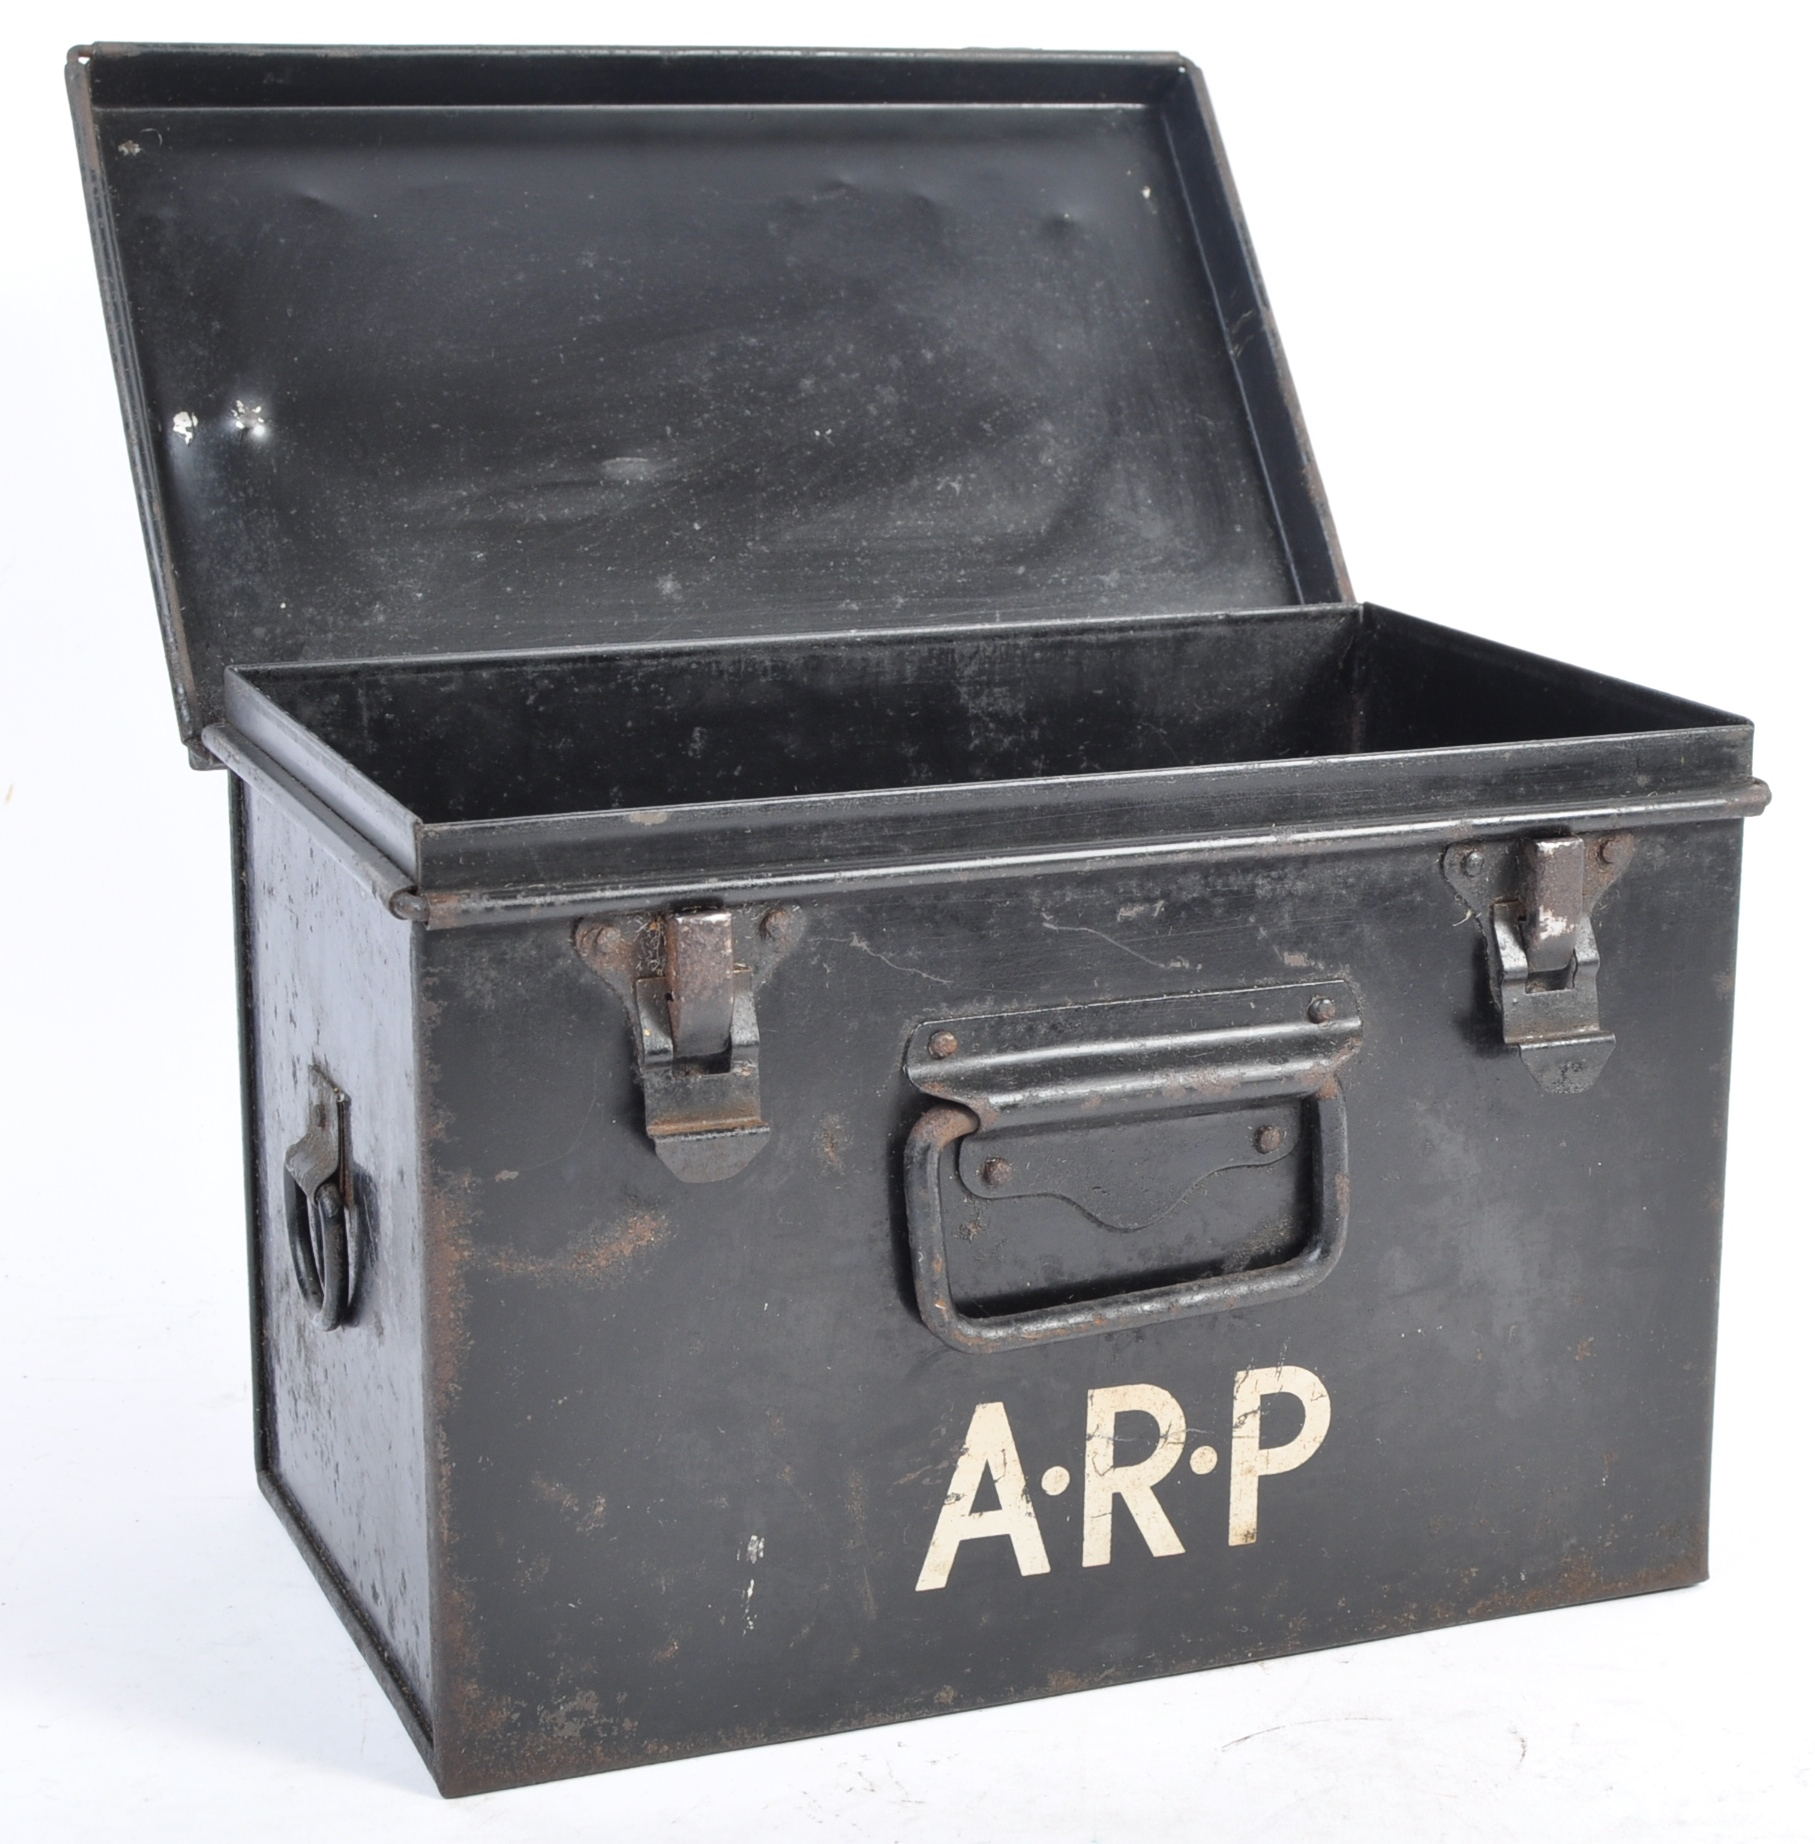 ORIGINAL WWII SECOND WORLD WAR AIR RAID PRECAUTIONS FIRST AID TIN - Image 2 of 8